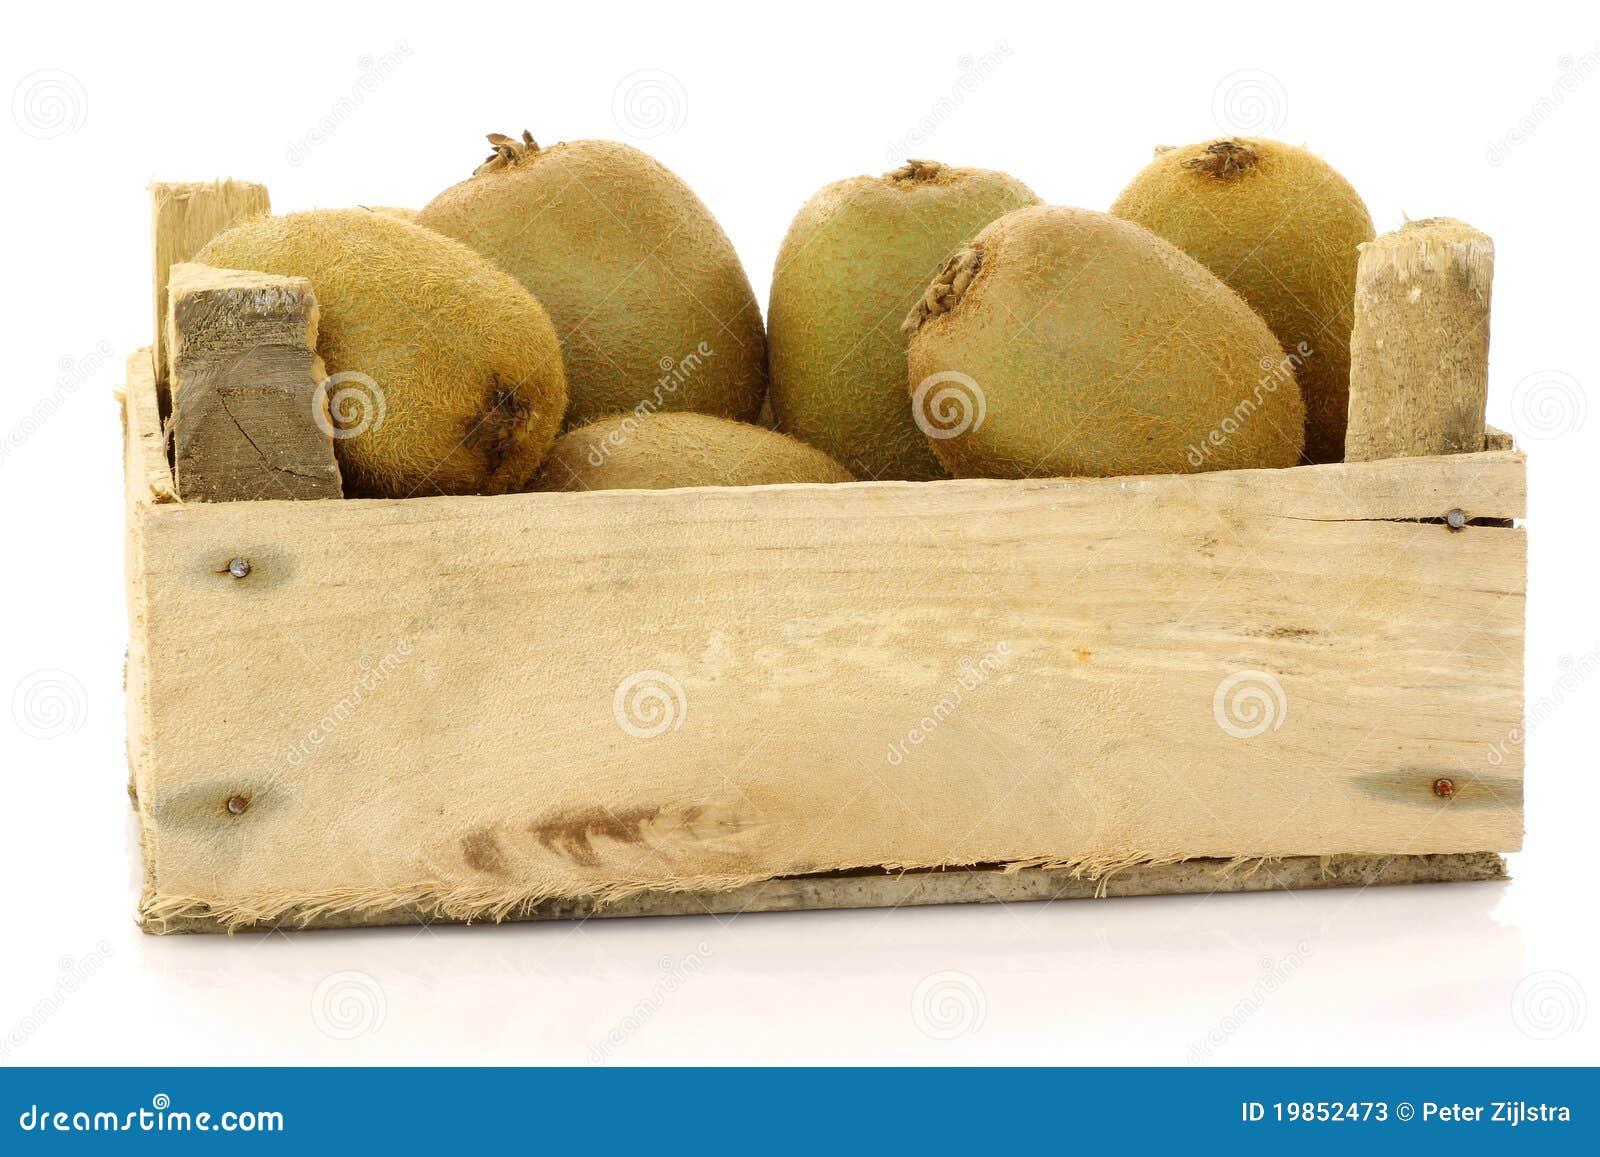 Magnificent Kiwi Fruit in Crate 1300 x 957 · 143 kB · jpeg